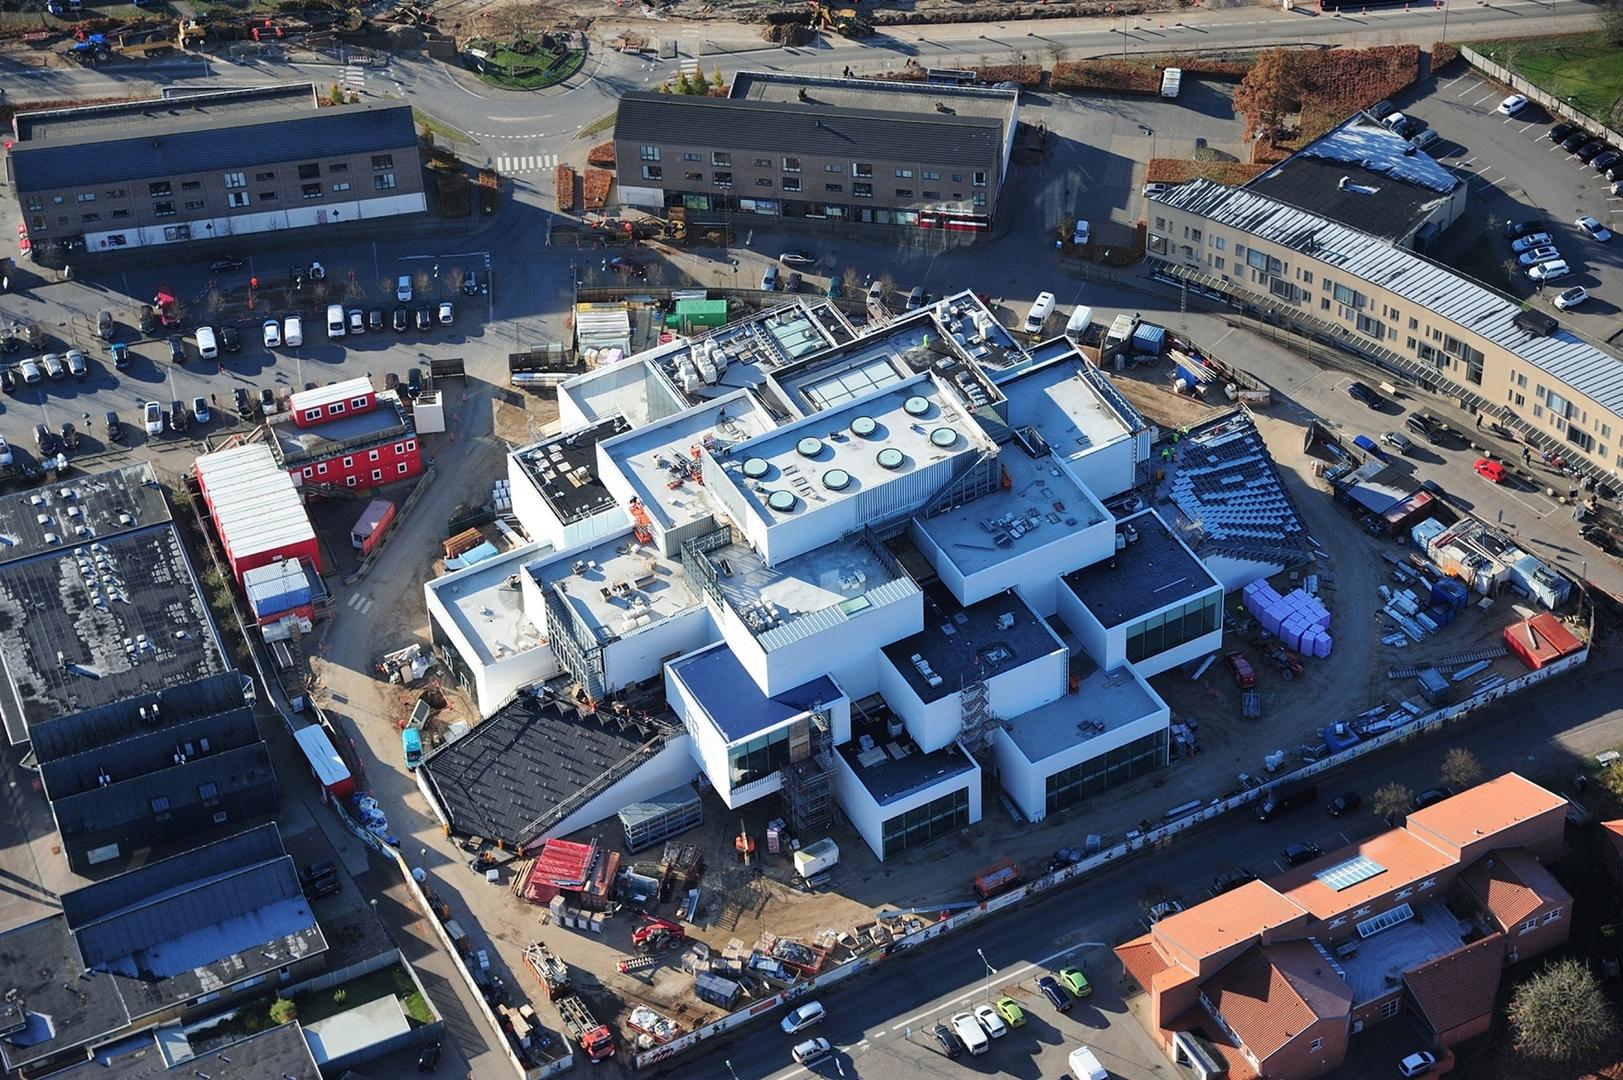 LEGO-House-aerial-photo-December-2016_Image by Bjarne Sig Jensen (Copy)